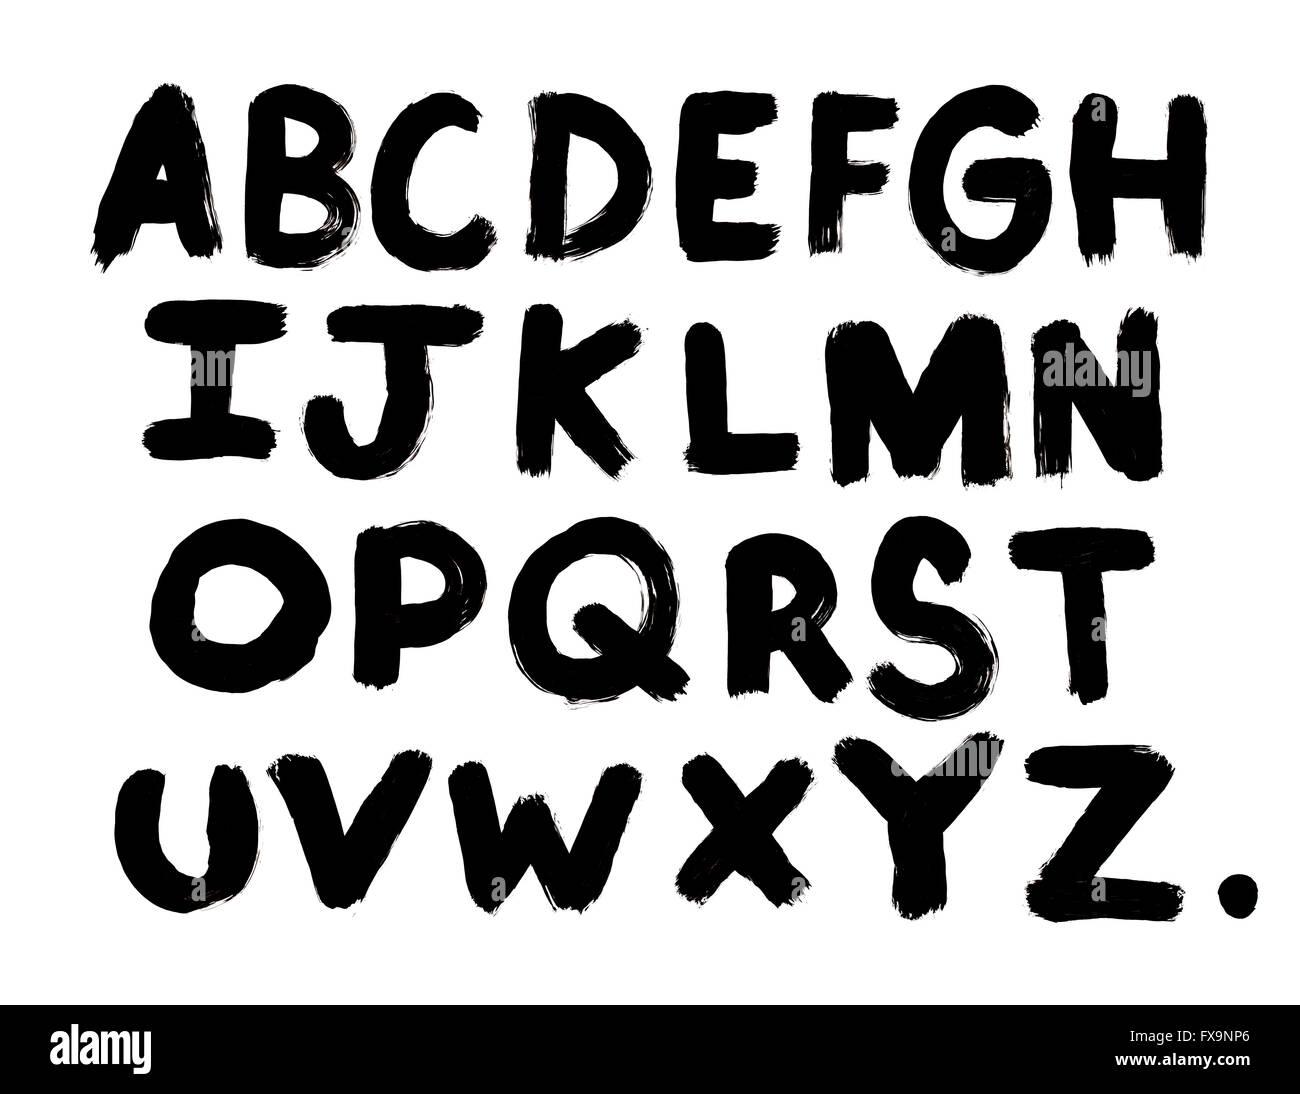 Black Paint Brush Letters Isolated on White Background. - Stock Image